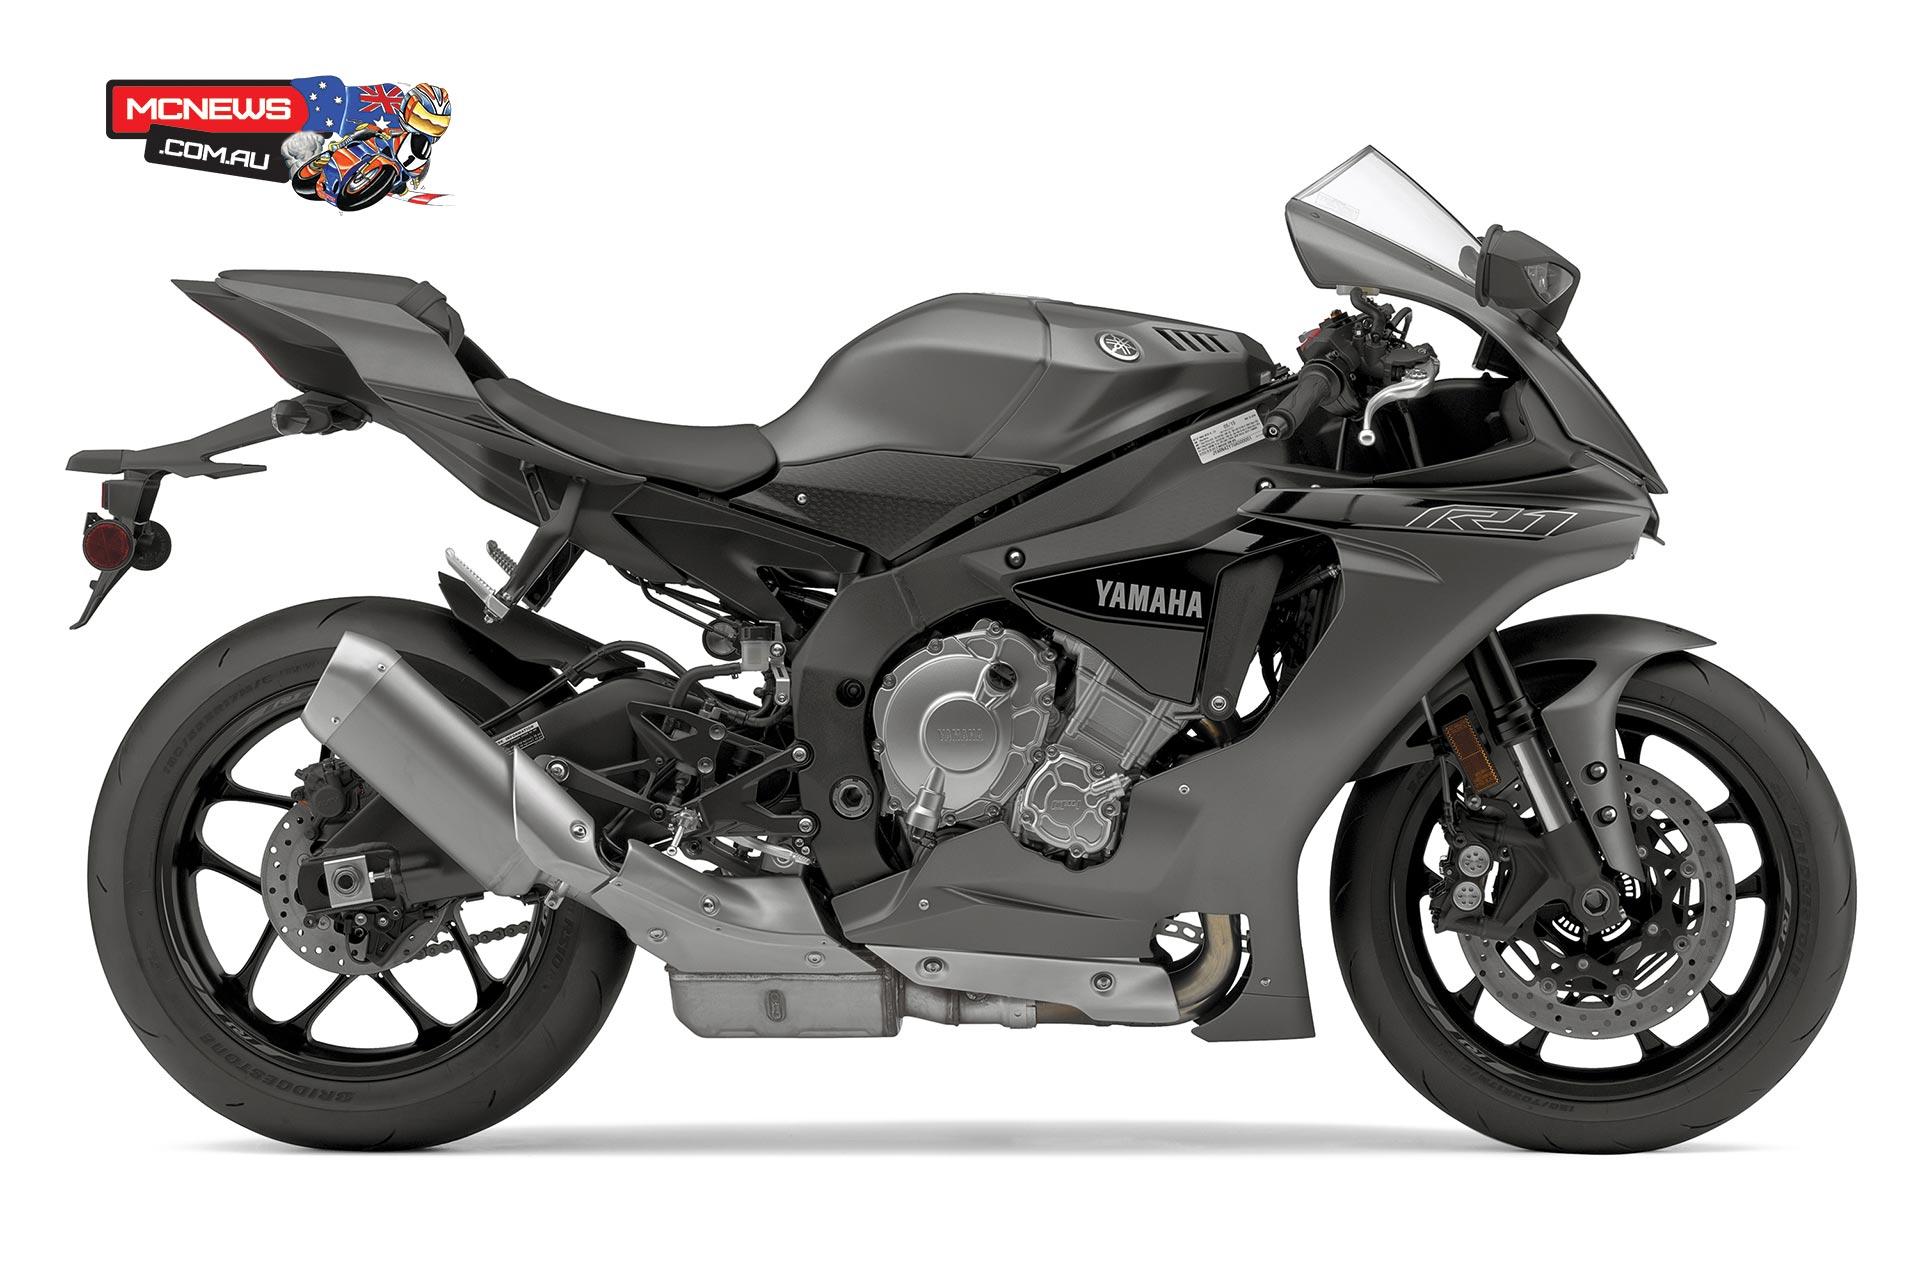 2016 Yamaha YZF R1 YZF R6 Colours